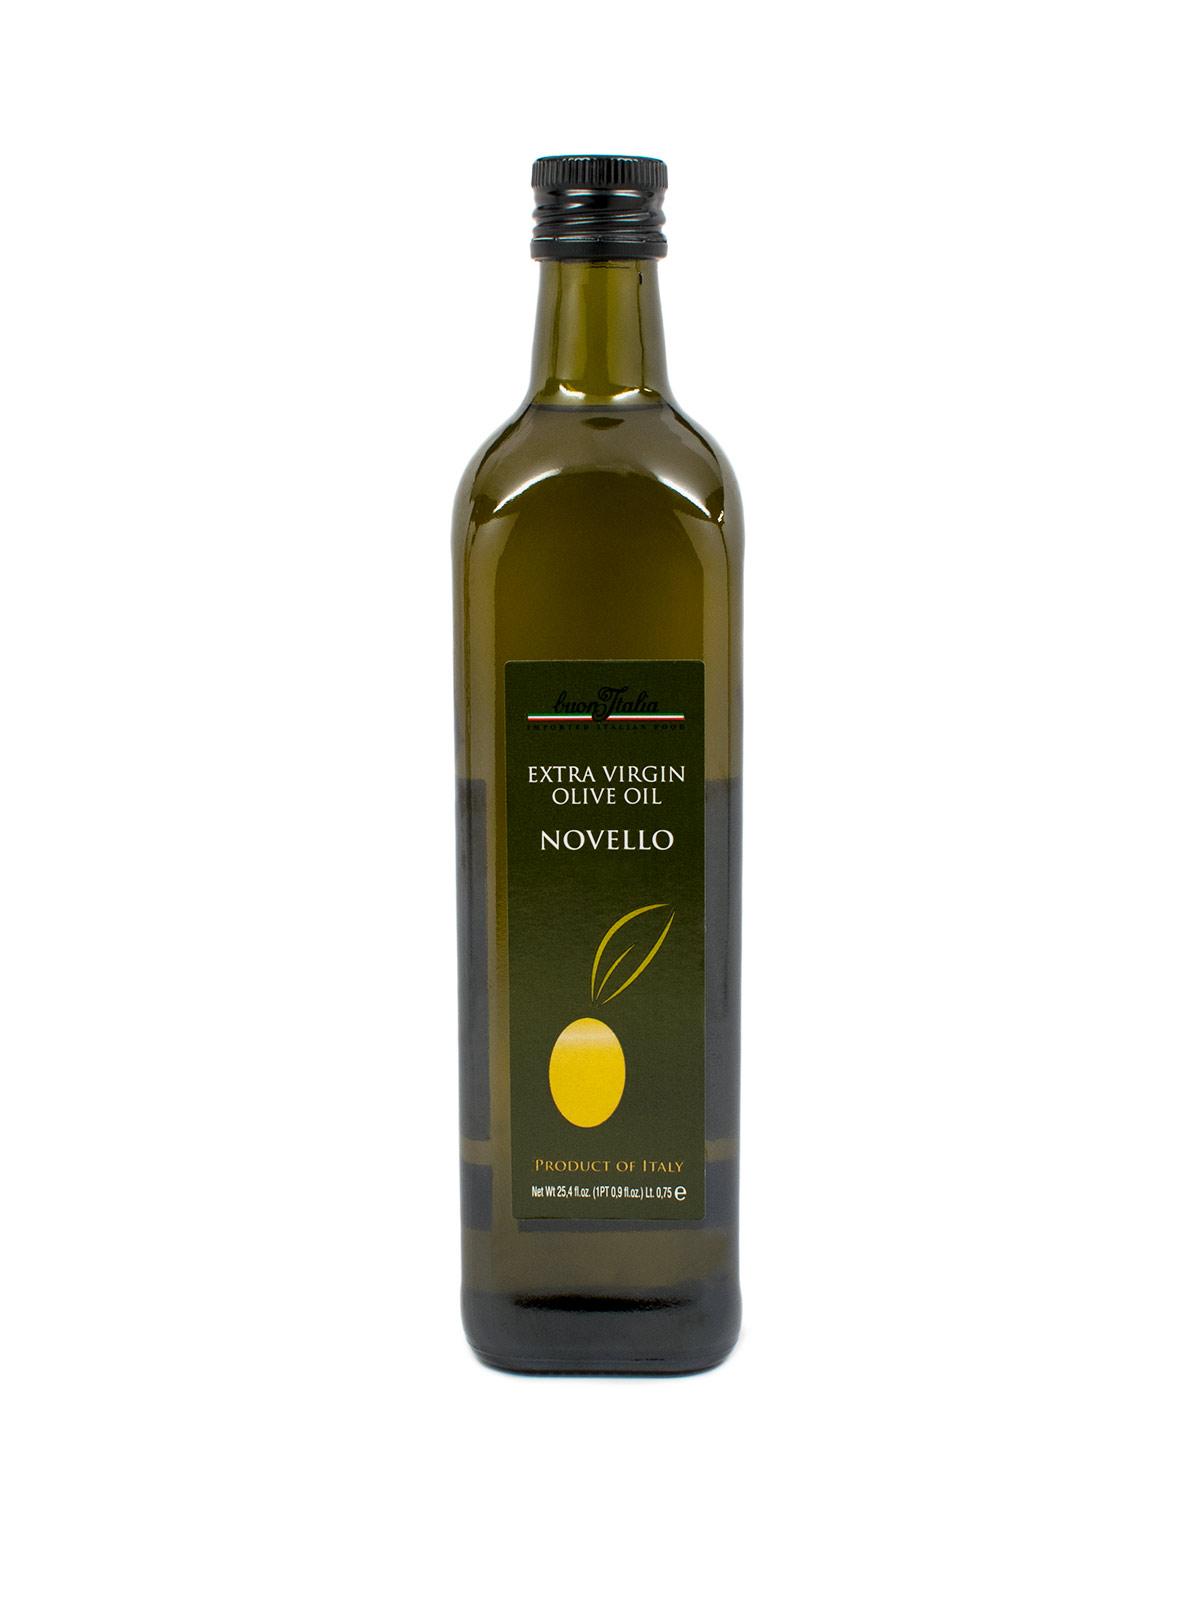 Buon'Italia Novello Extra Virgin Olive Oil - Oils & Vinegars - Buon'Italia